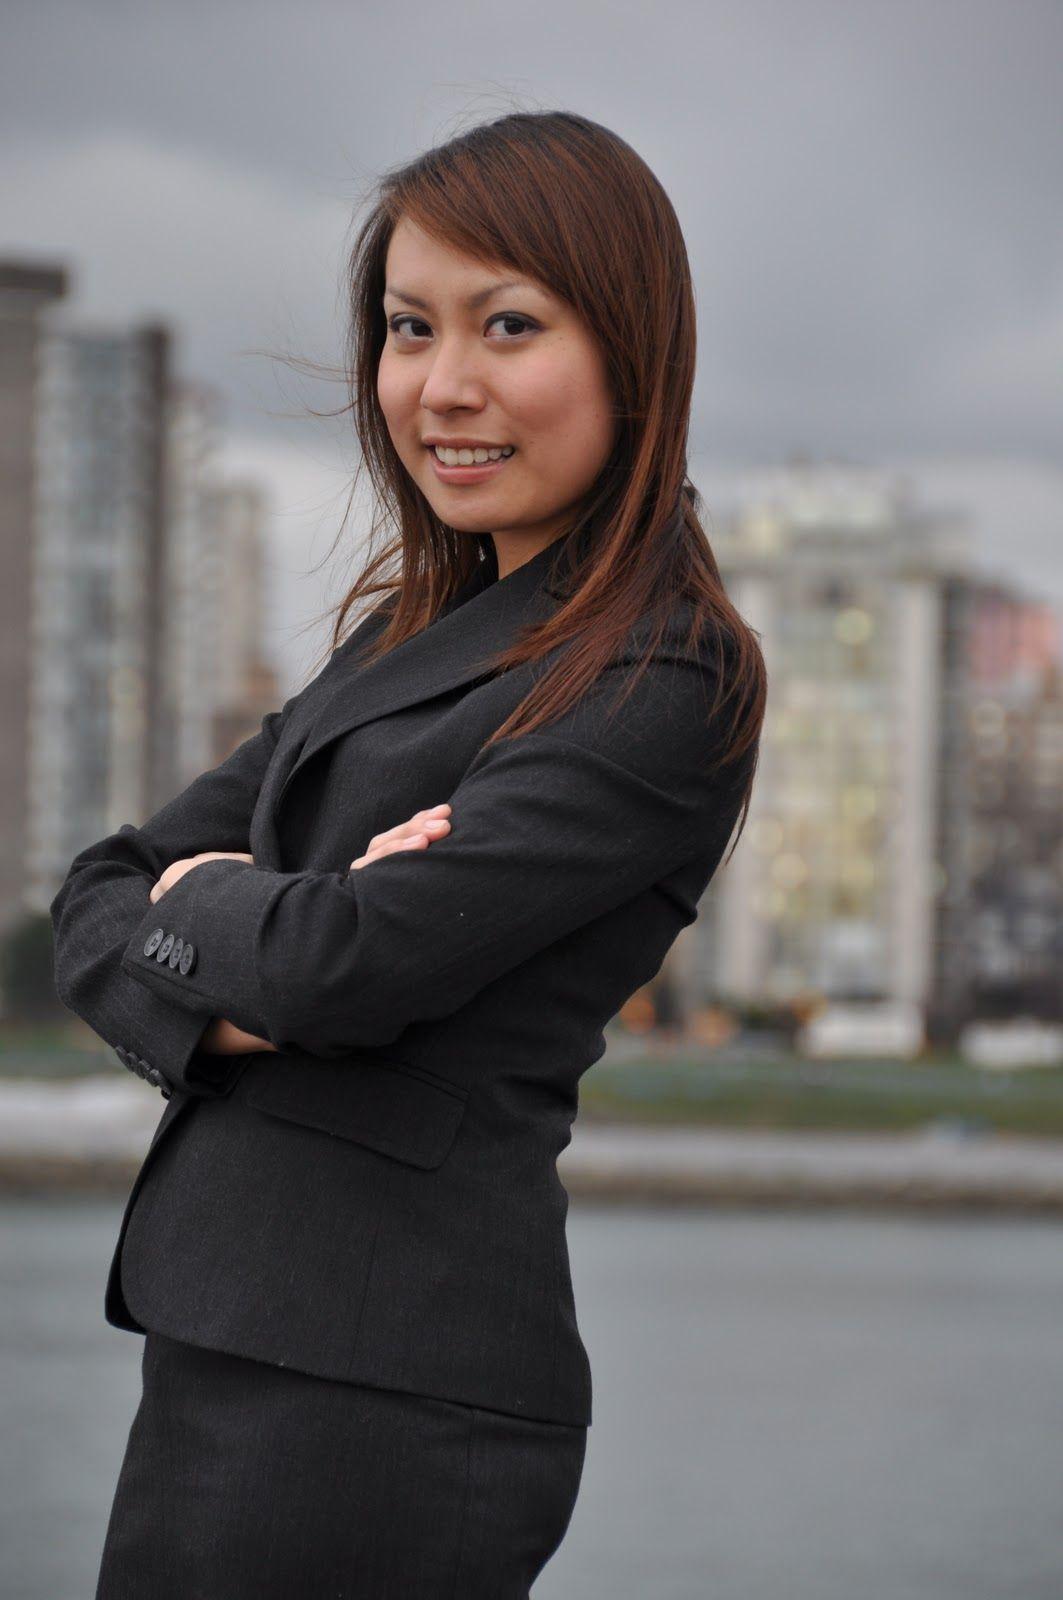 Professional Headshot Headshots professional, Headshots